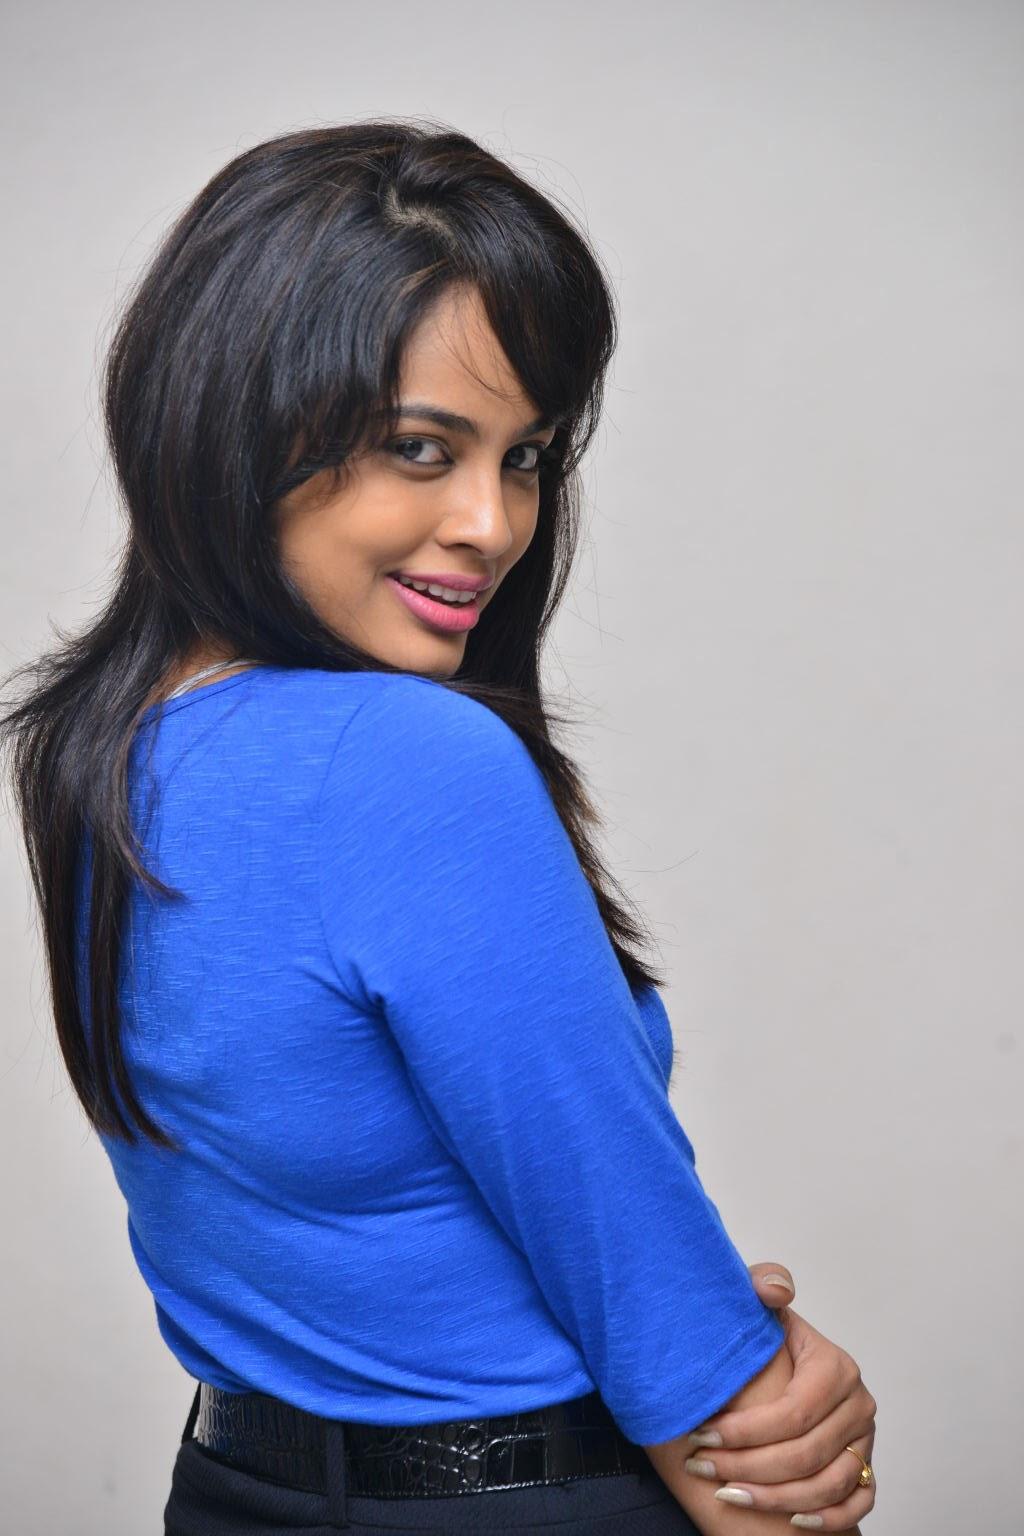 Nandita swtha sizzling in blue top-HQ-Photo-13